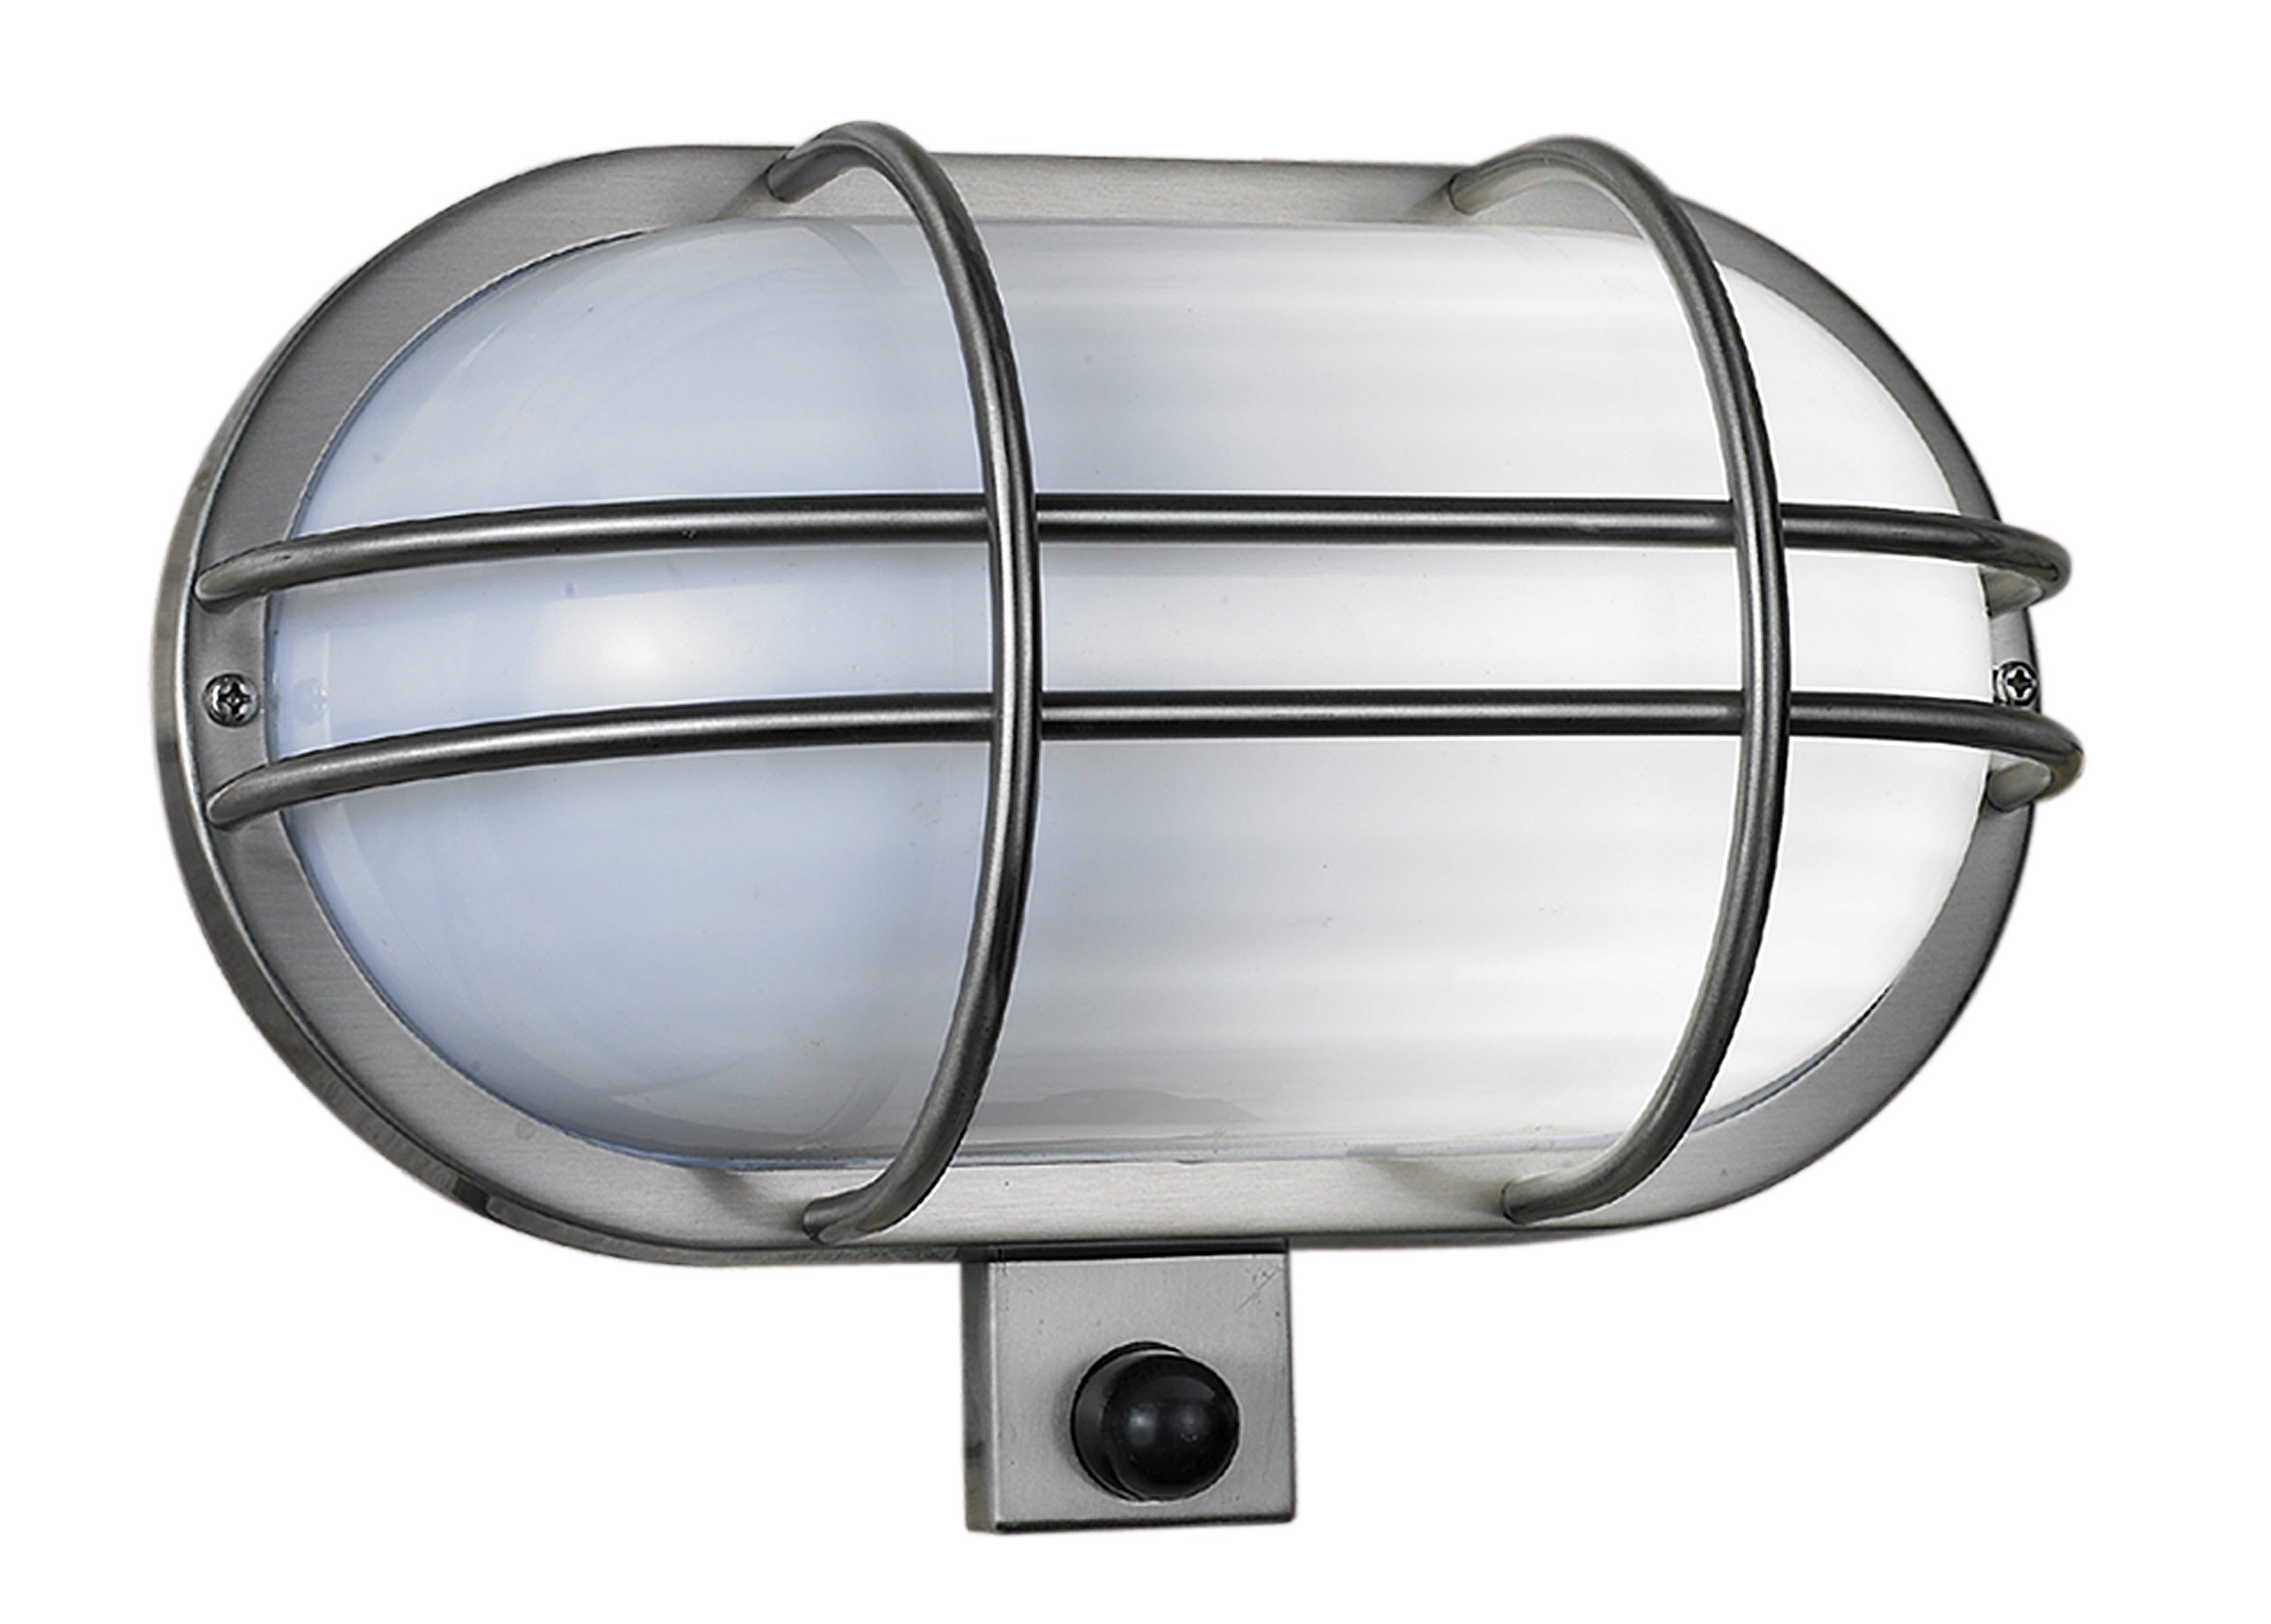 Ks Wandarmatuur Opb Sensor Lampen, 180X260x110mm